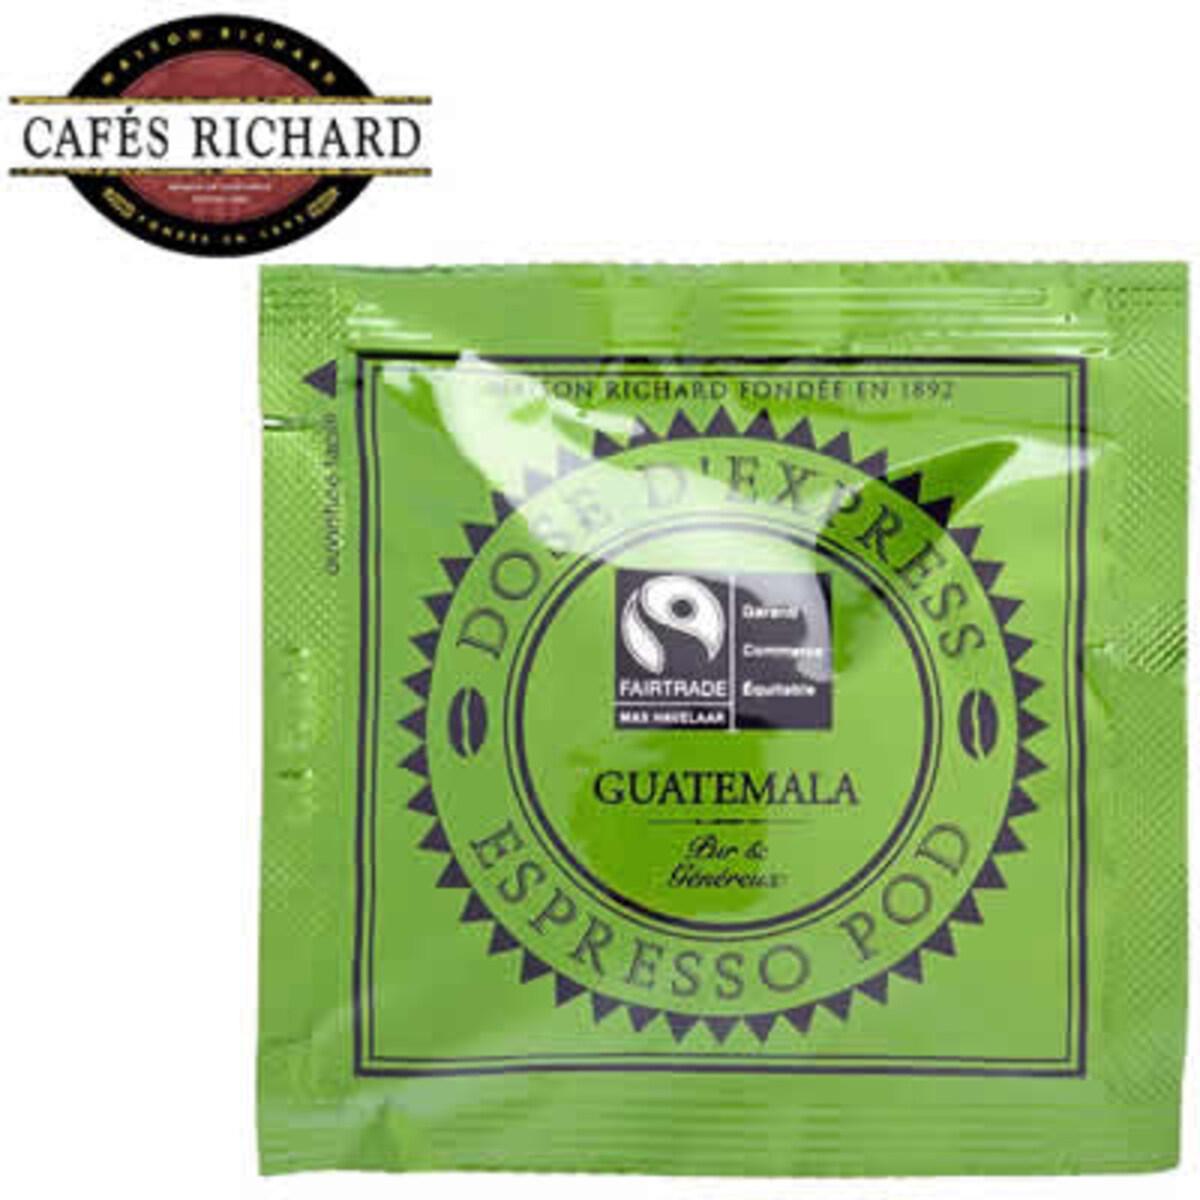 Cafés Richard Guatemala Max Havelaar - 1 бр доза в опаковка